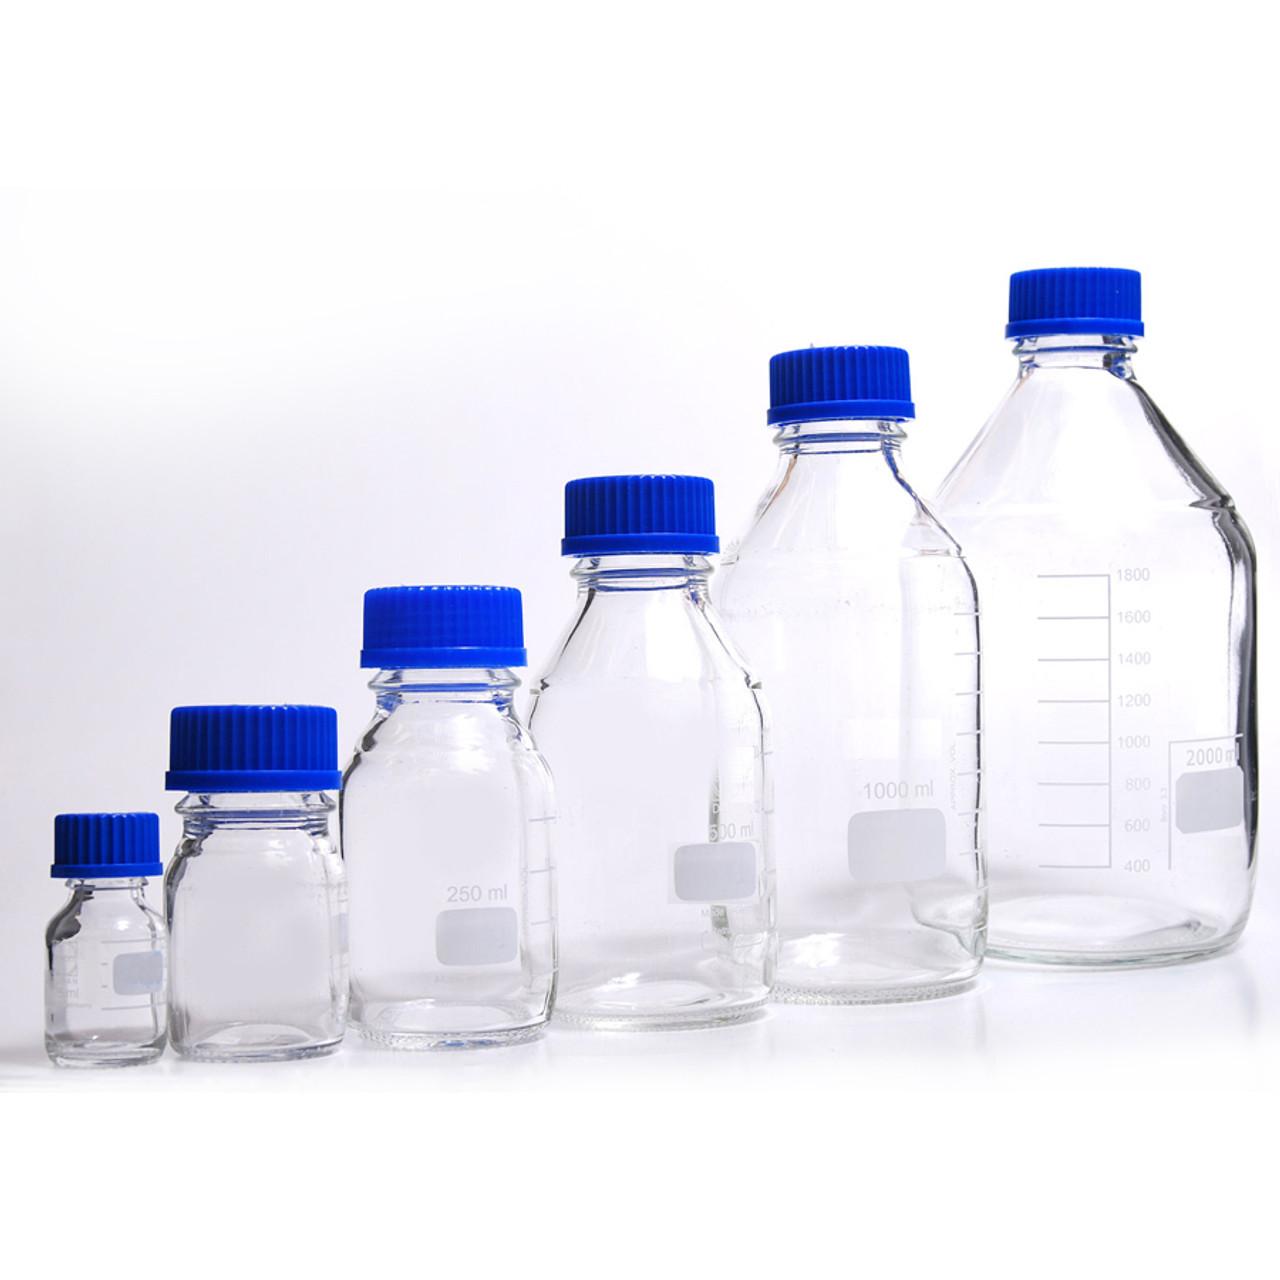 Schott Cls 1172 2l Glass Media Bottles 2 000ml Gl 45